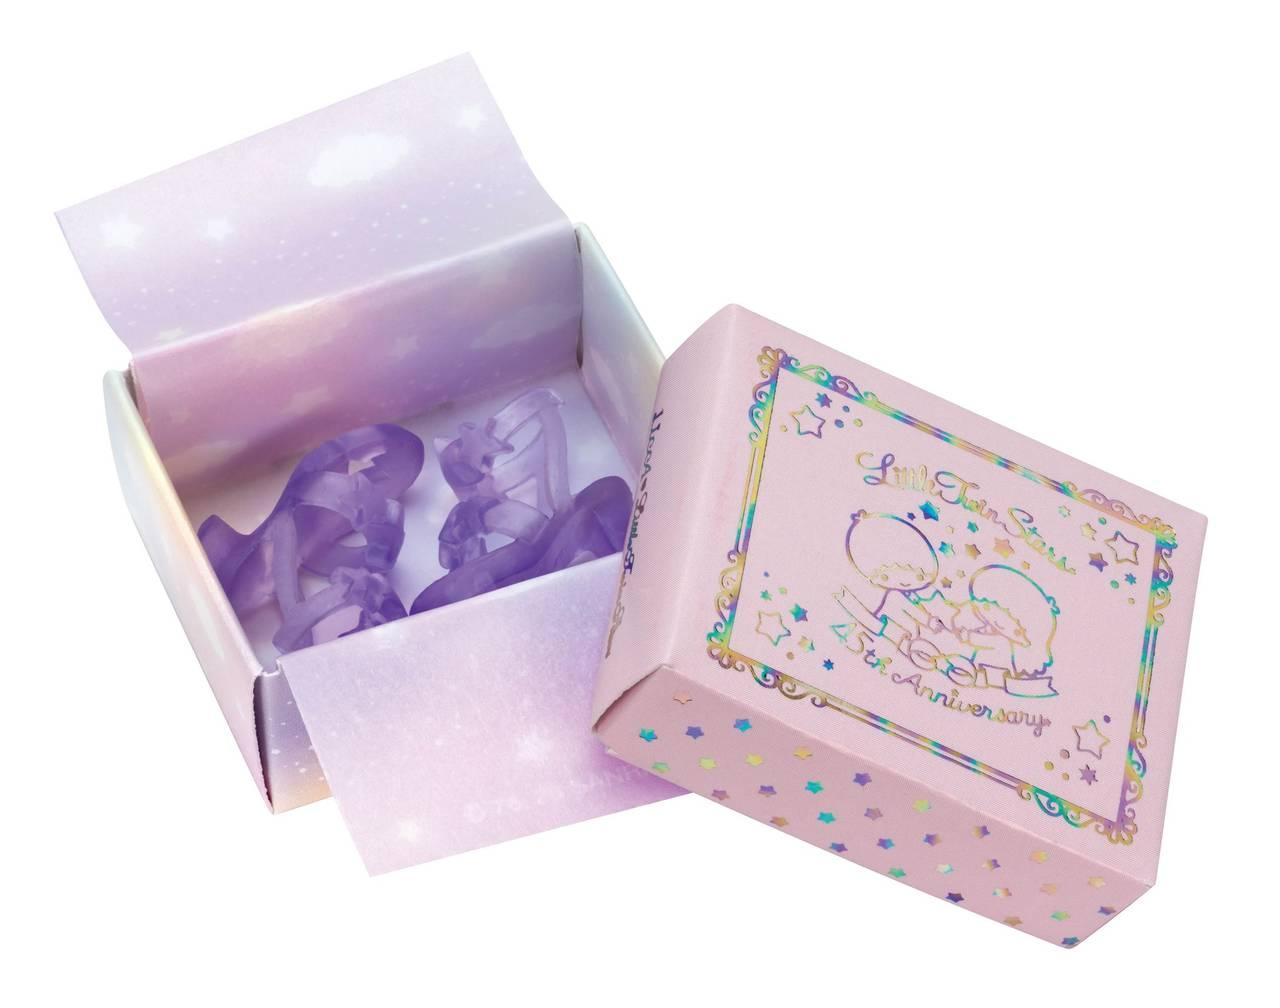 「LiccAスタイリッシュドールコレクション Little Twin Stars Anniversary Style」12